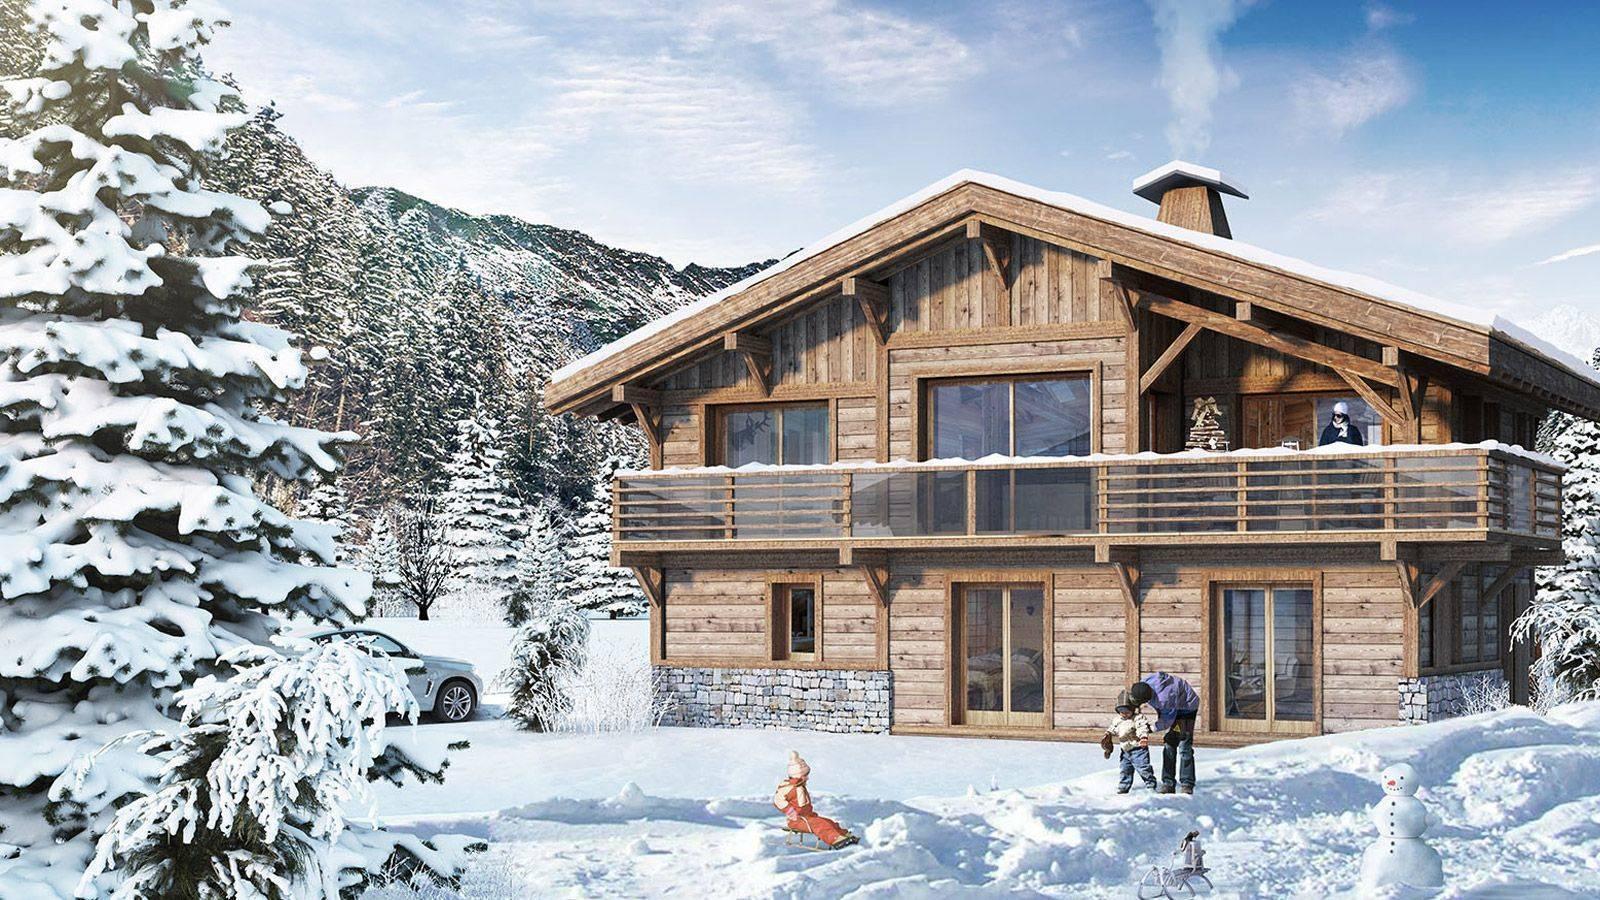 Vente Chalet 154 M² Neuf Chamonix-Mont-Blanc À 74400 1 824 000 € pour Achat Chalet Chamonix